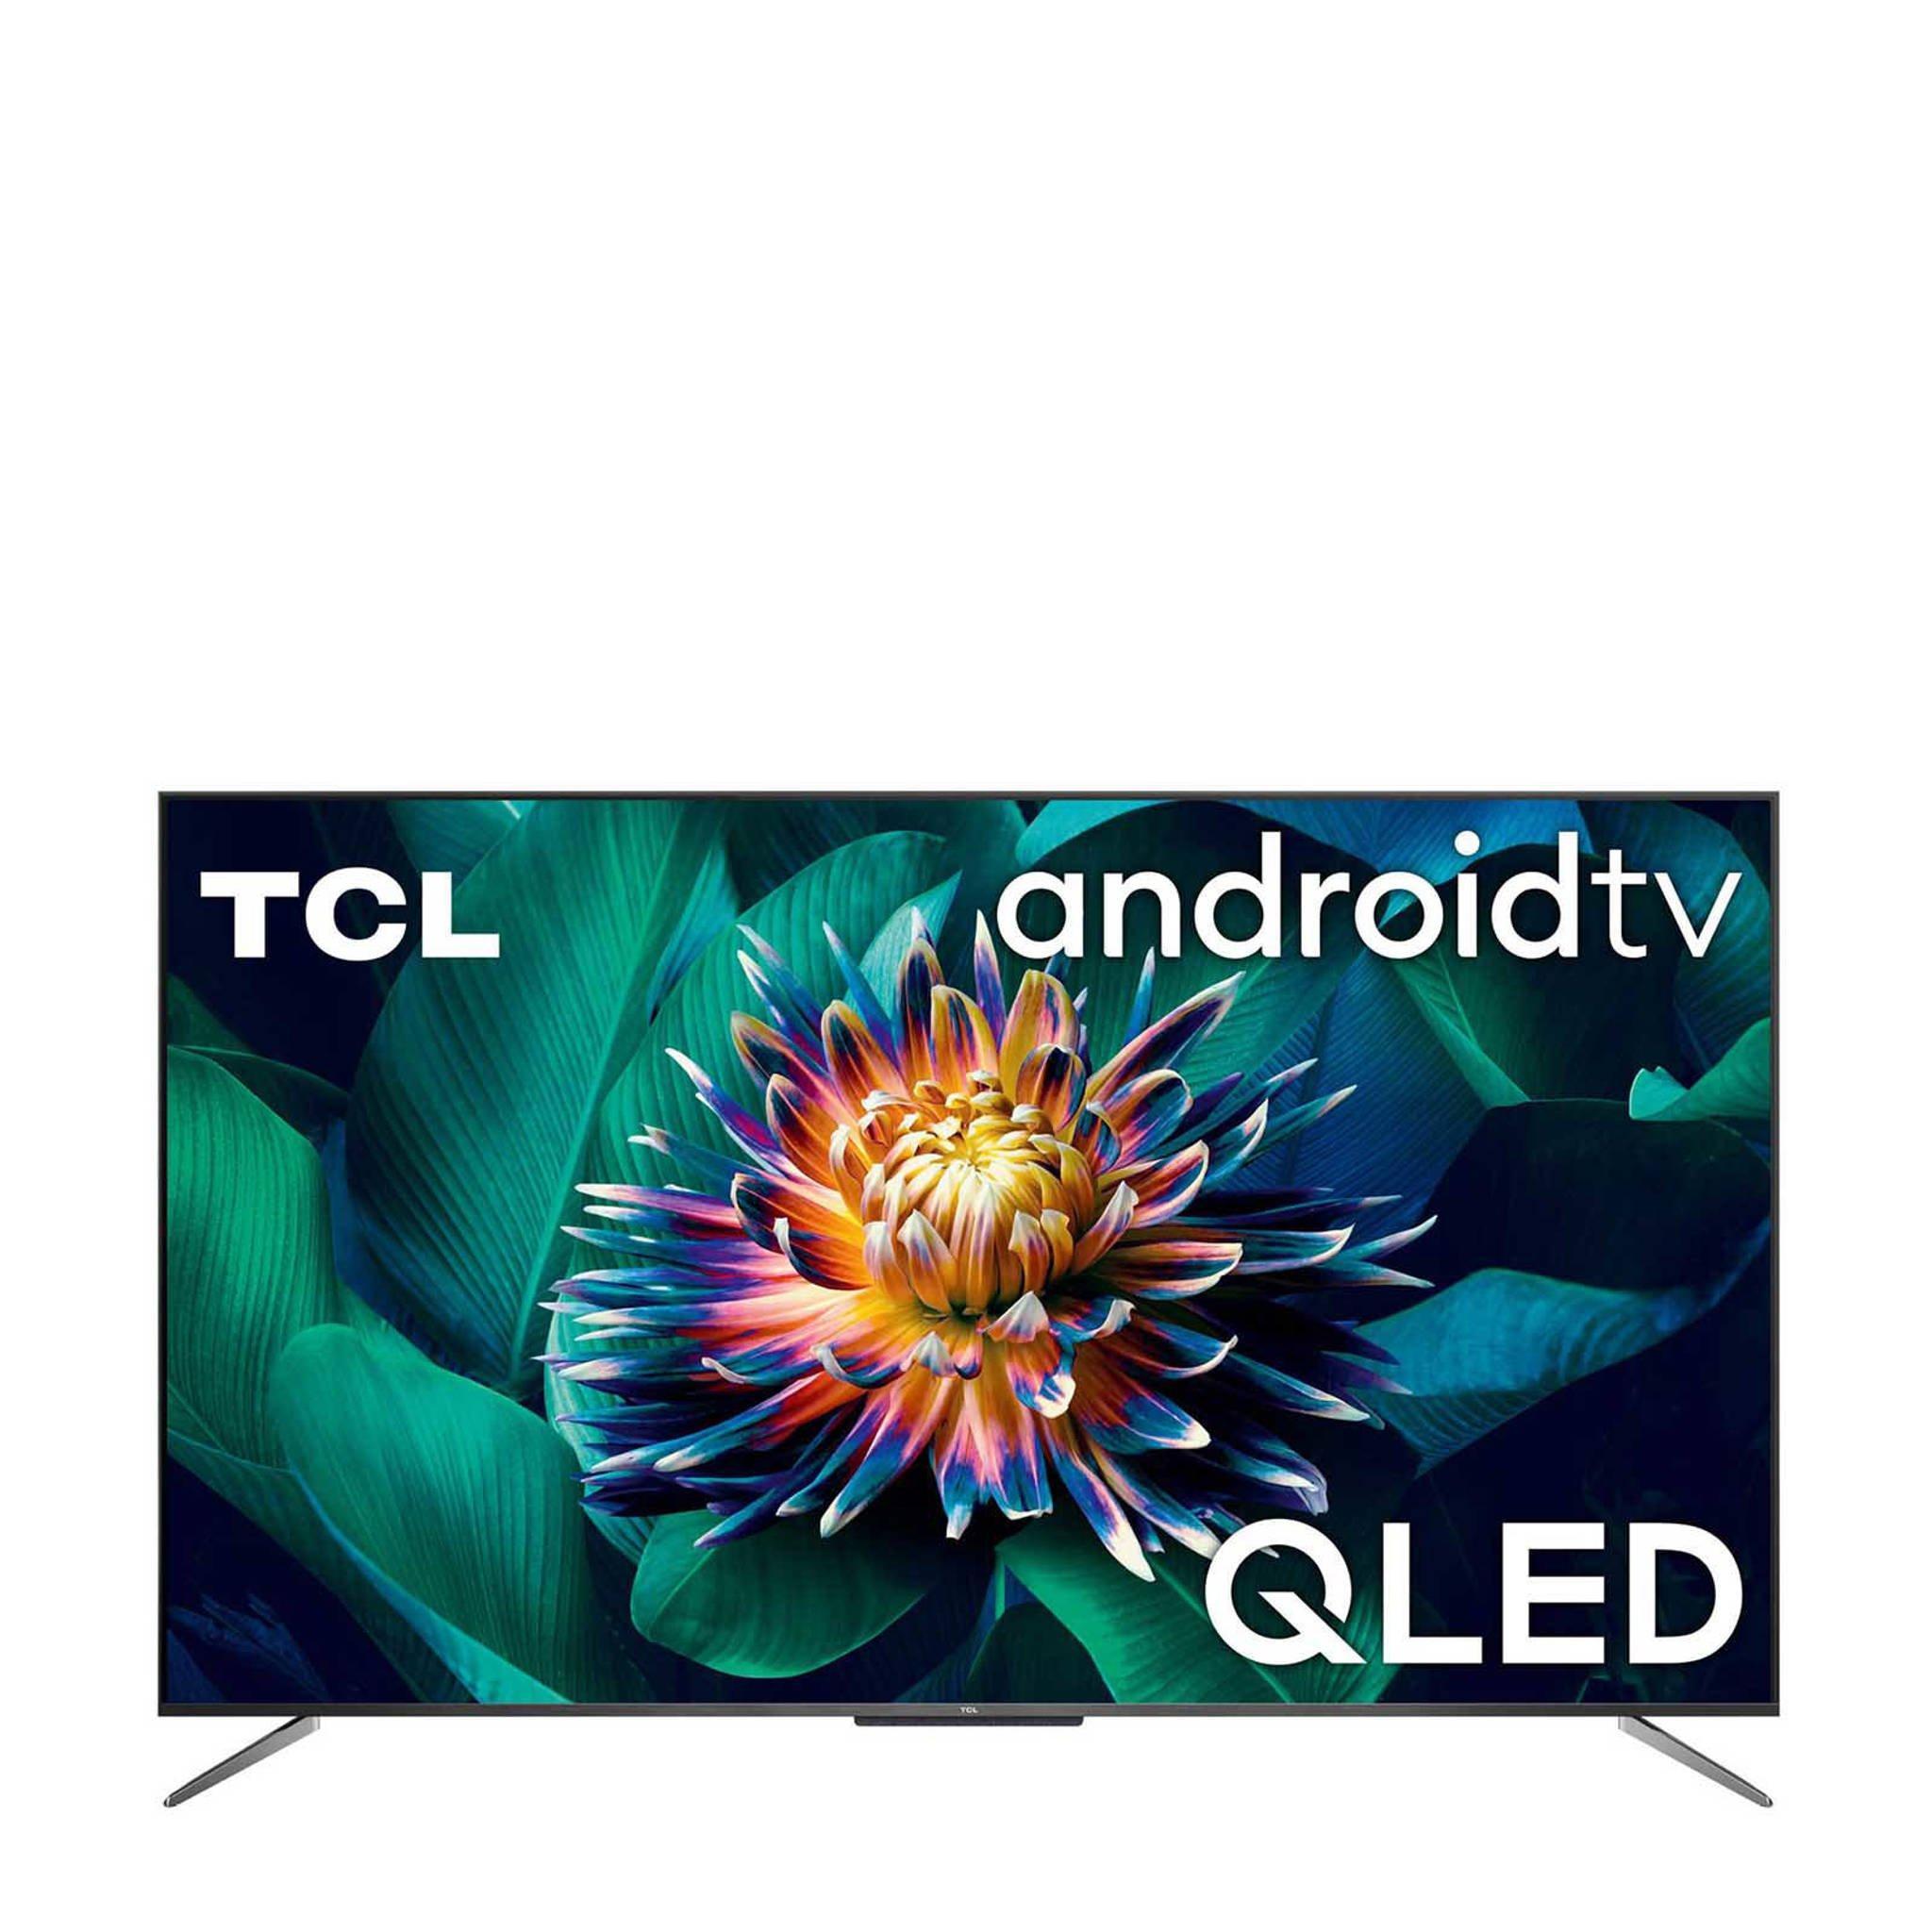 "TCL 65C715 65"" 4K Ultra HD QLED TV voor 624,- (inclusief 75,- cashback)."